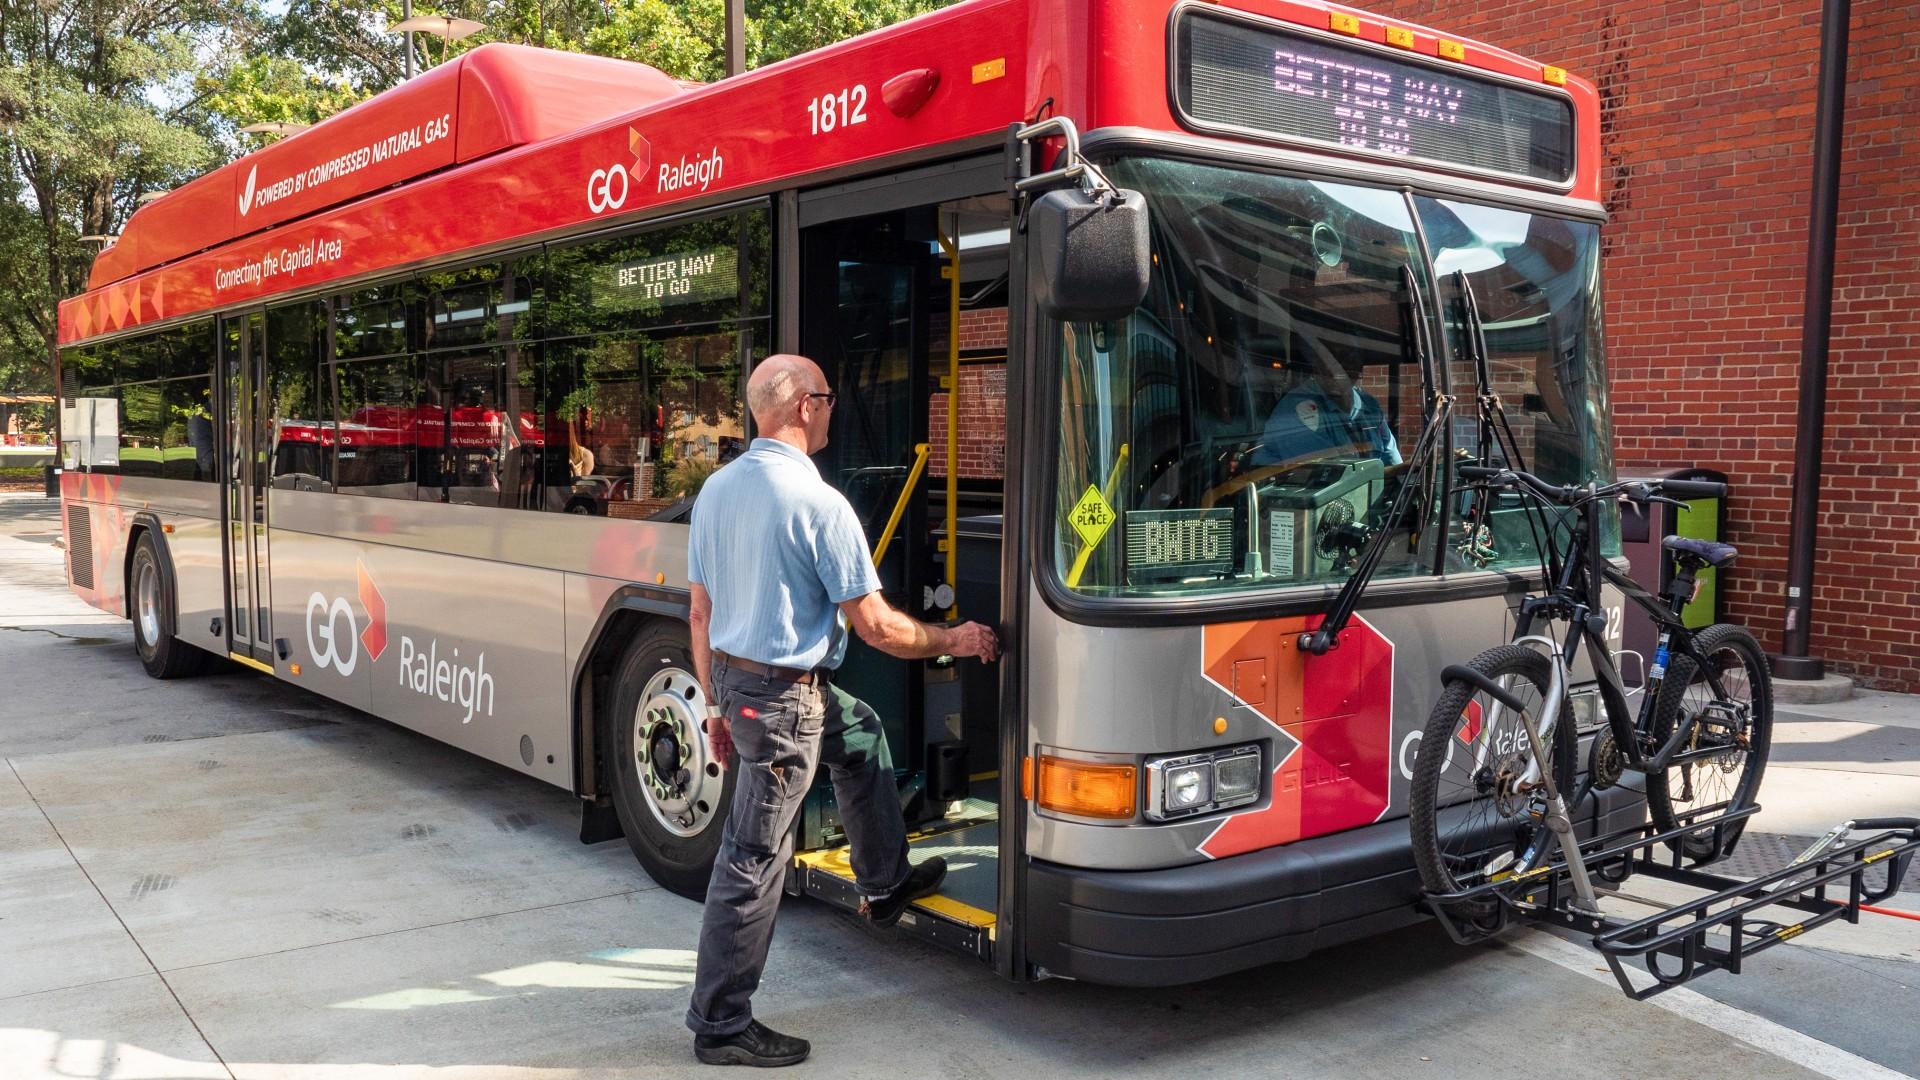 Man boarding bus after bike loaded on bus rack